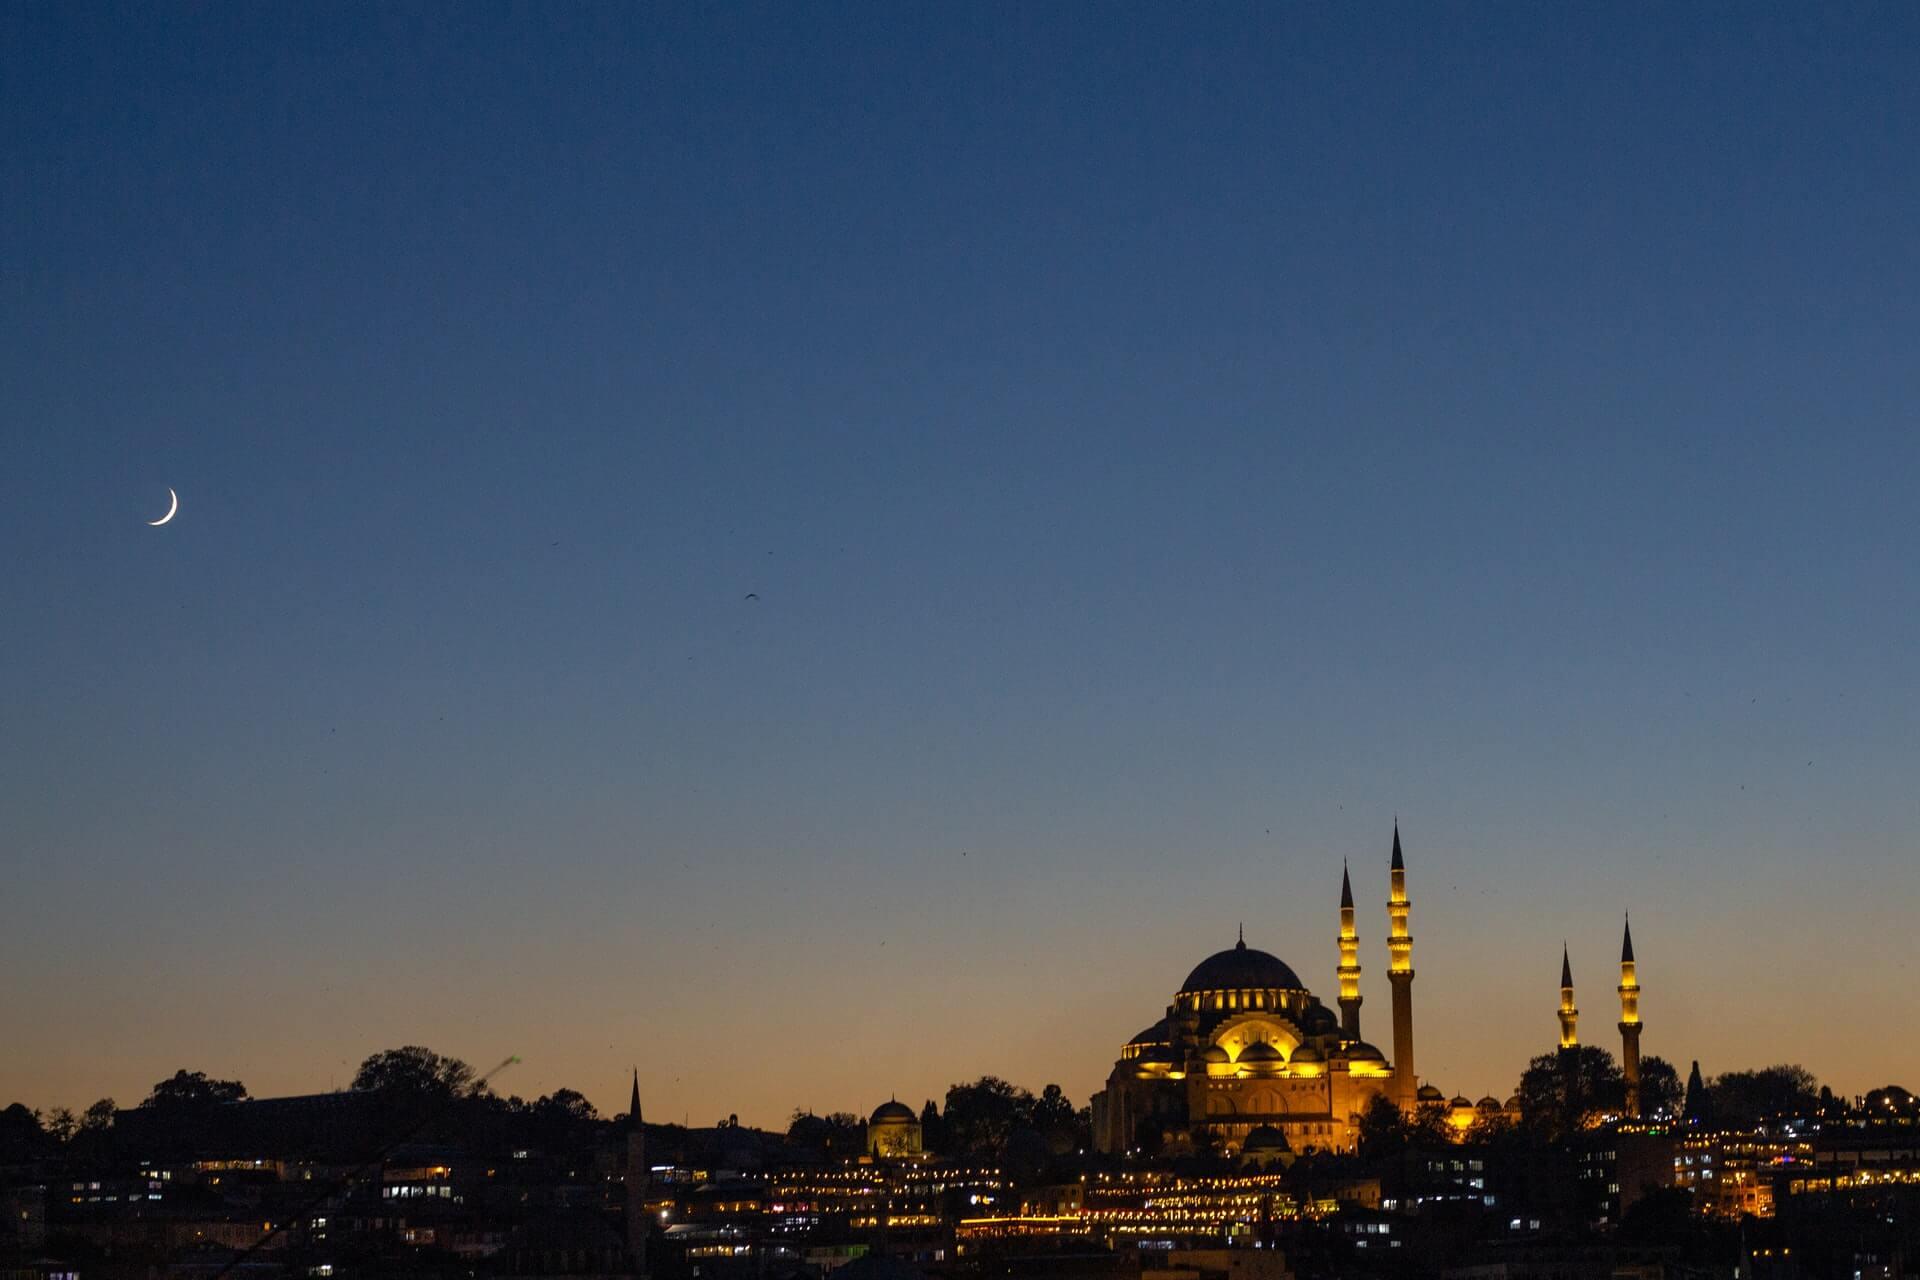 Hubungan Ilmu Kalam dengan Al-Qur'an